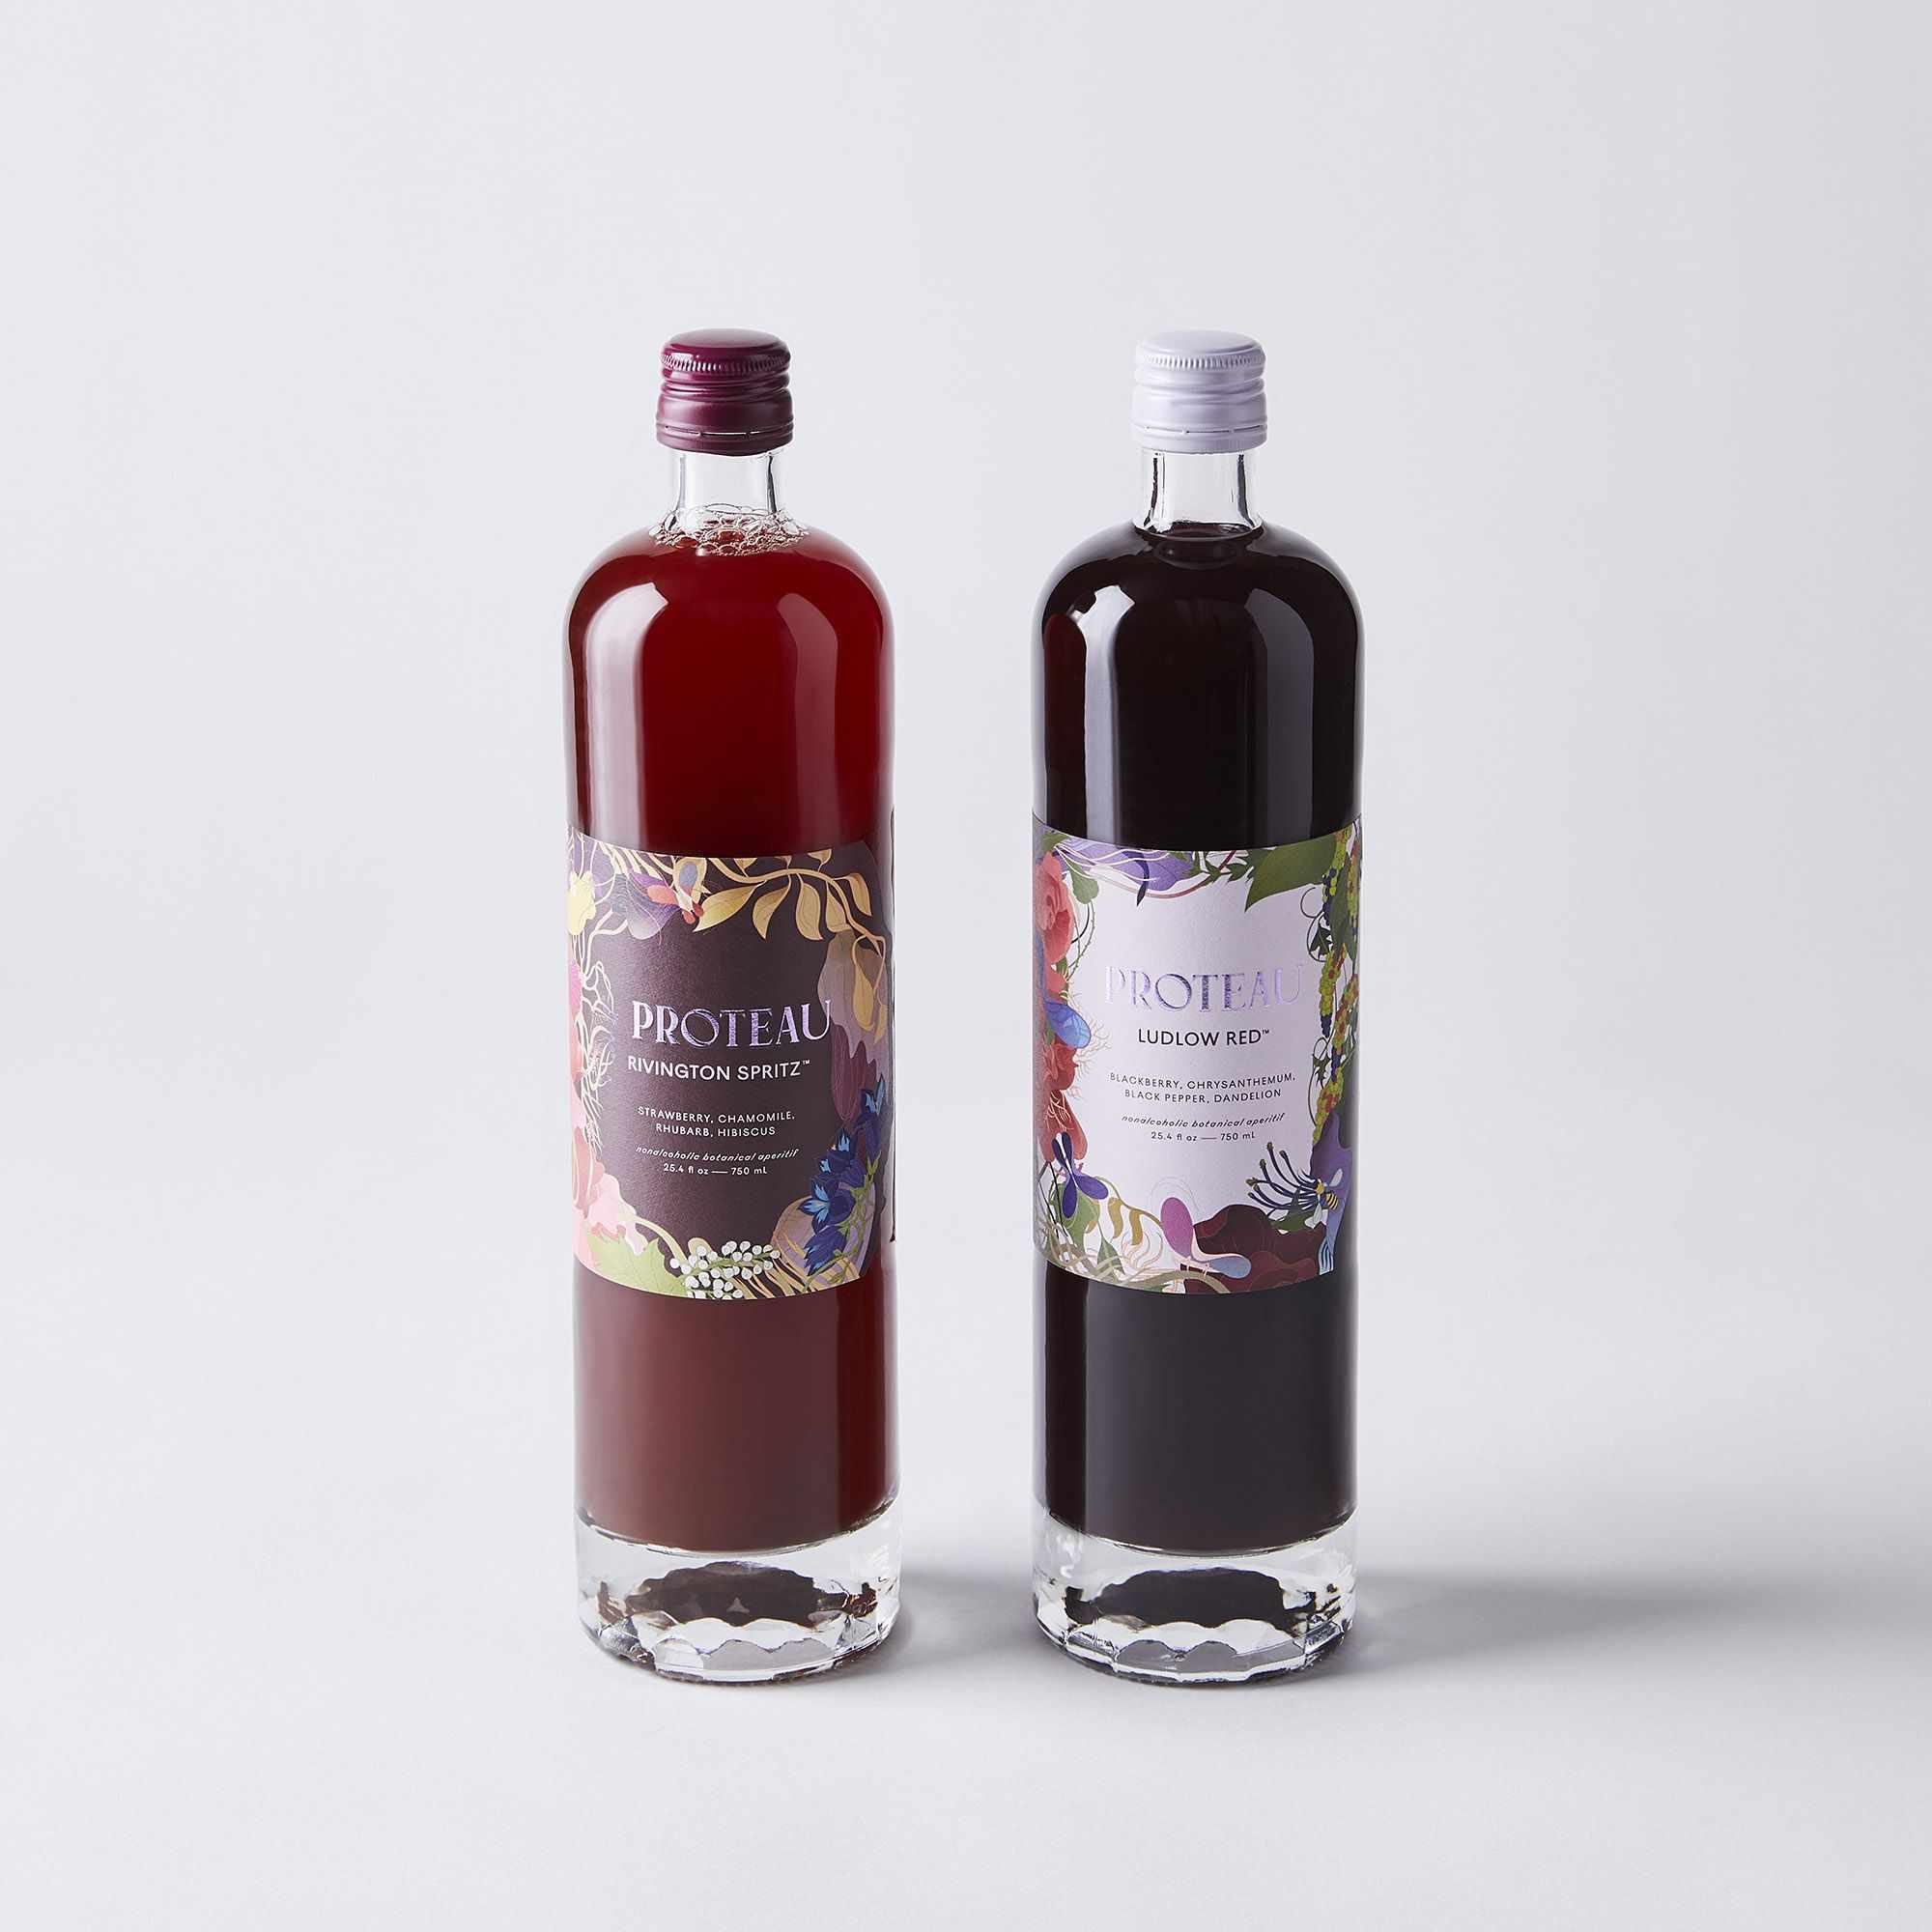 proteau-zero-proof-botanical-drinks